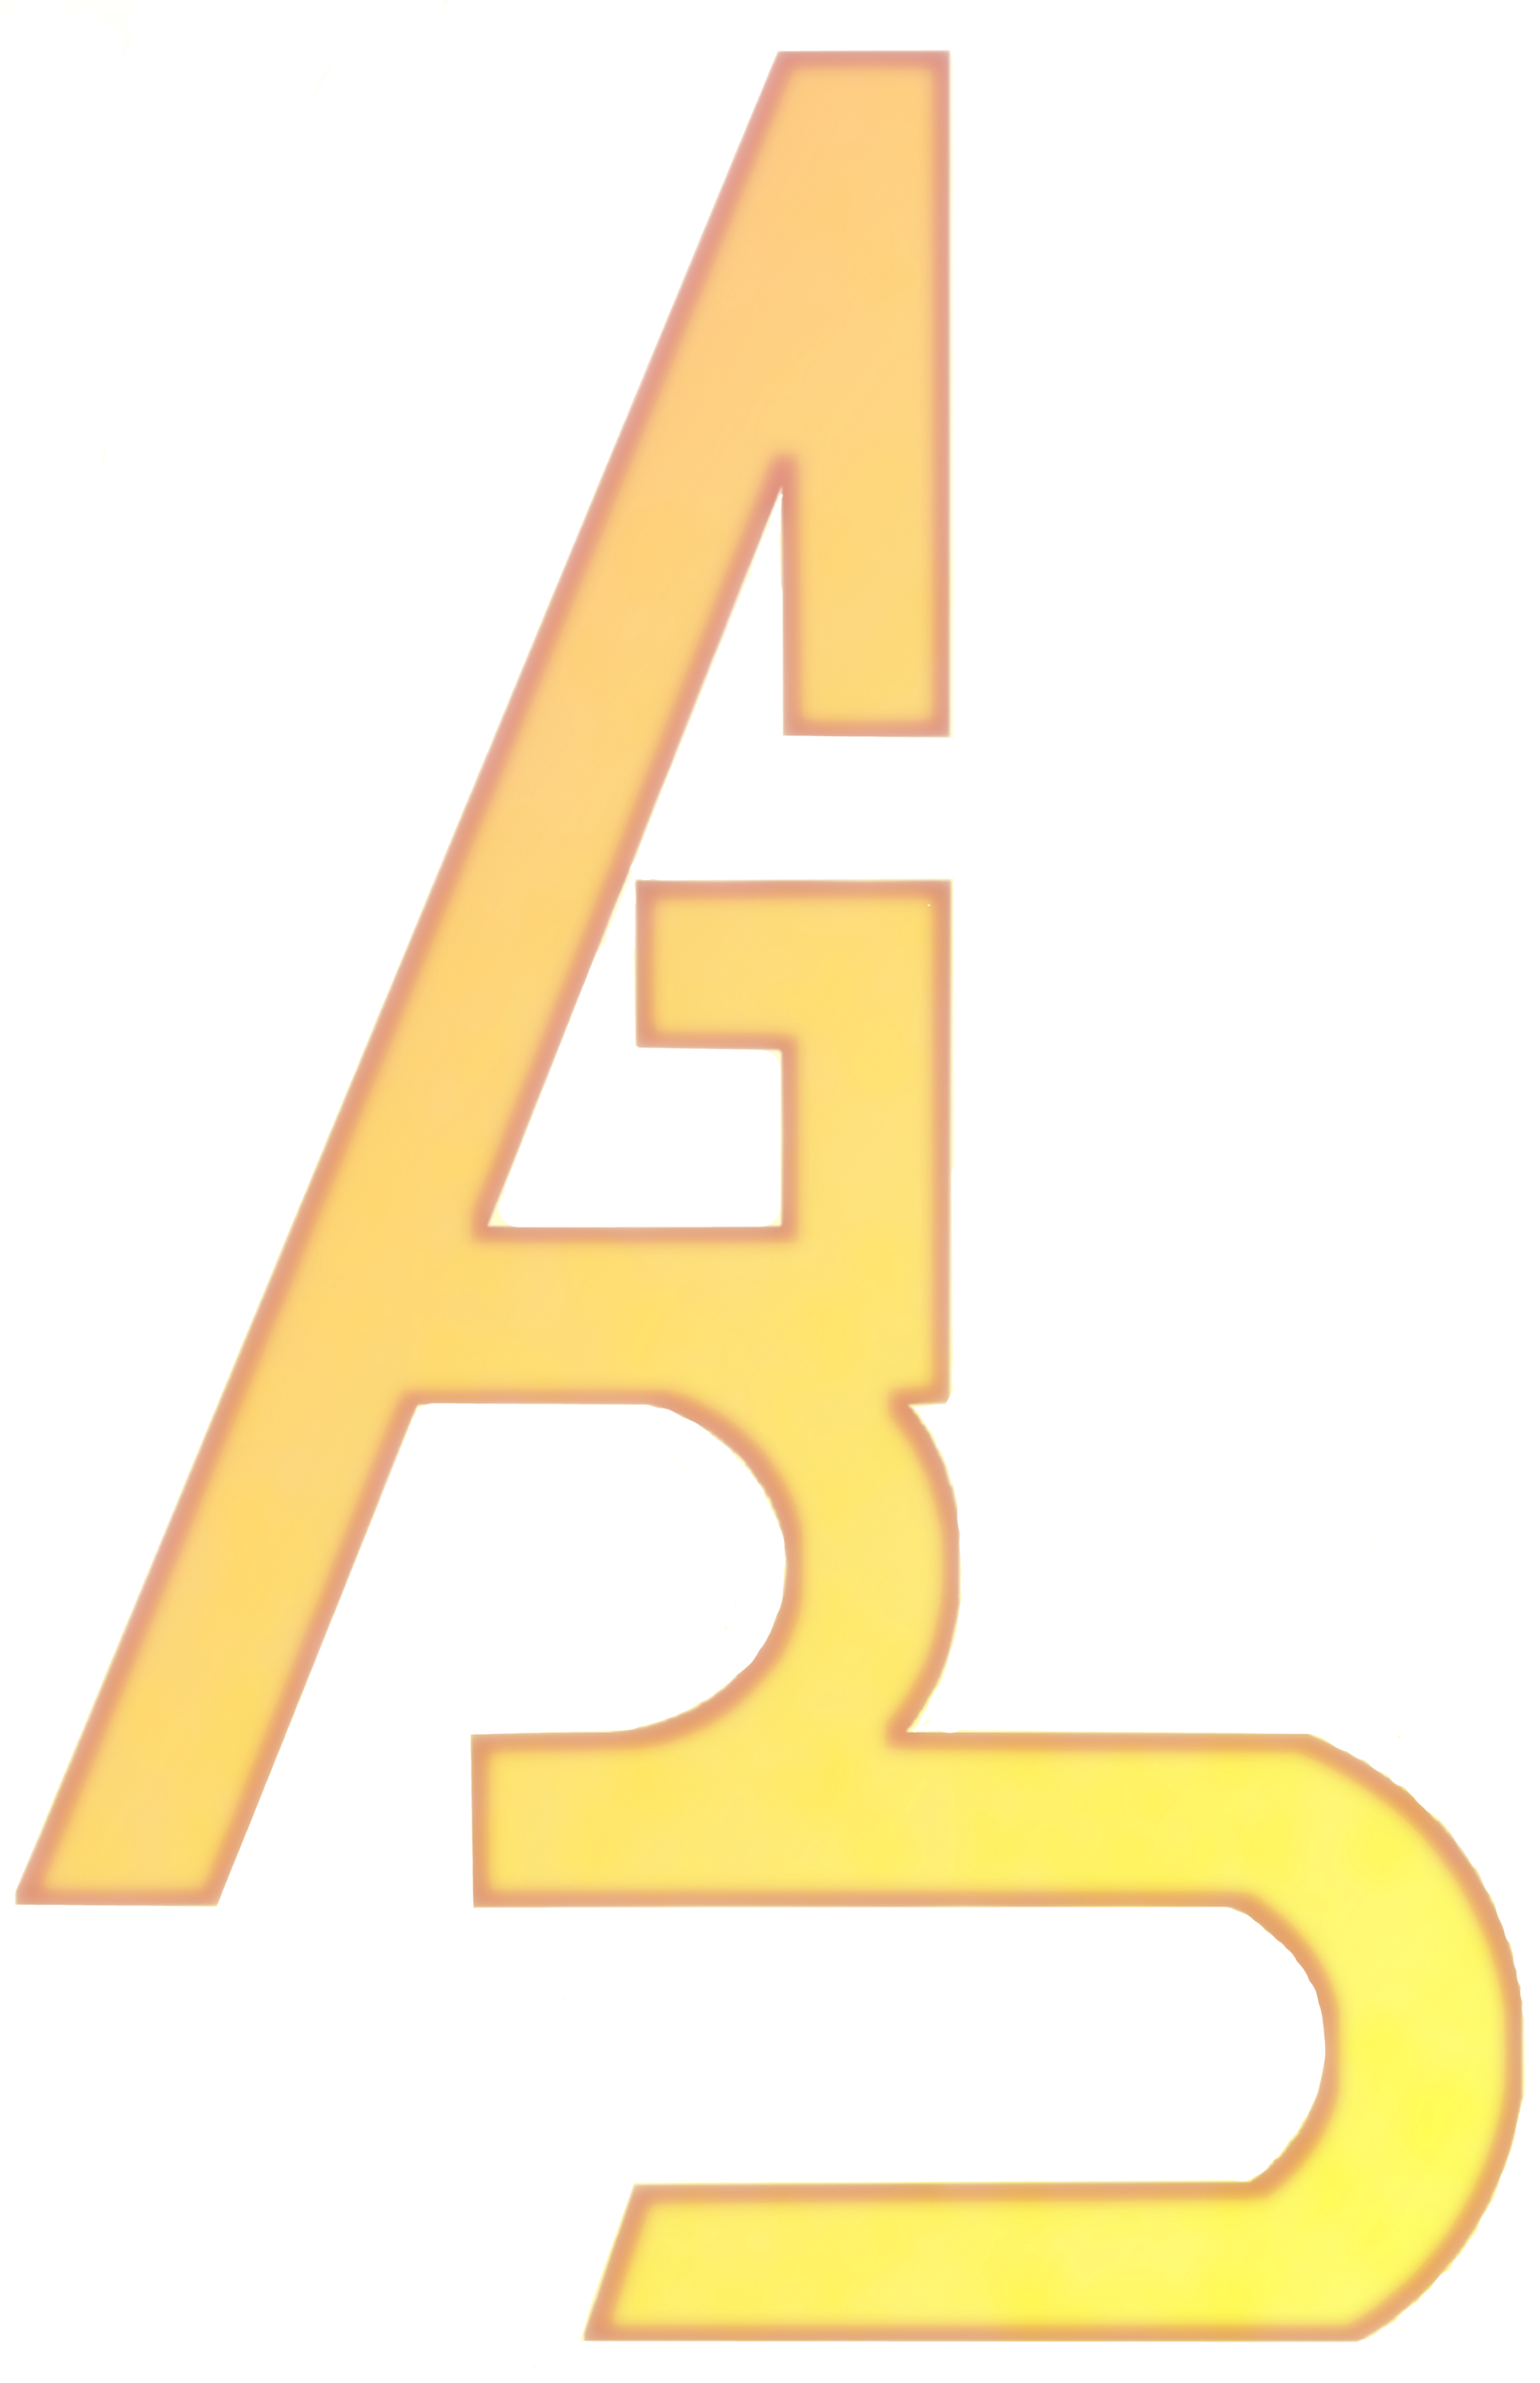 logo ABG Adriana Bodino Gretry